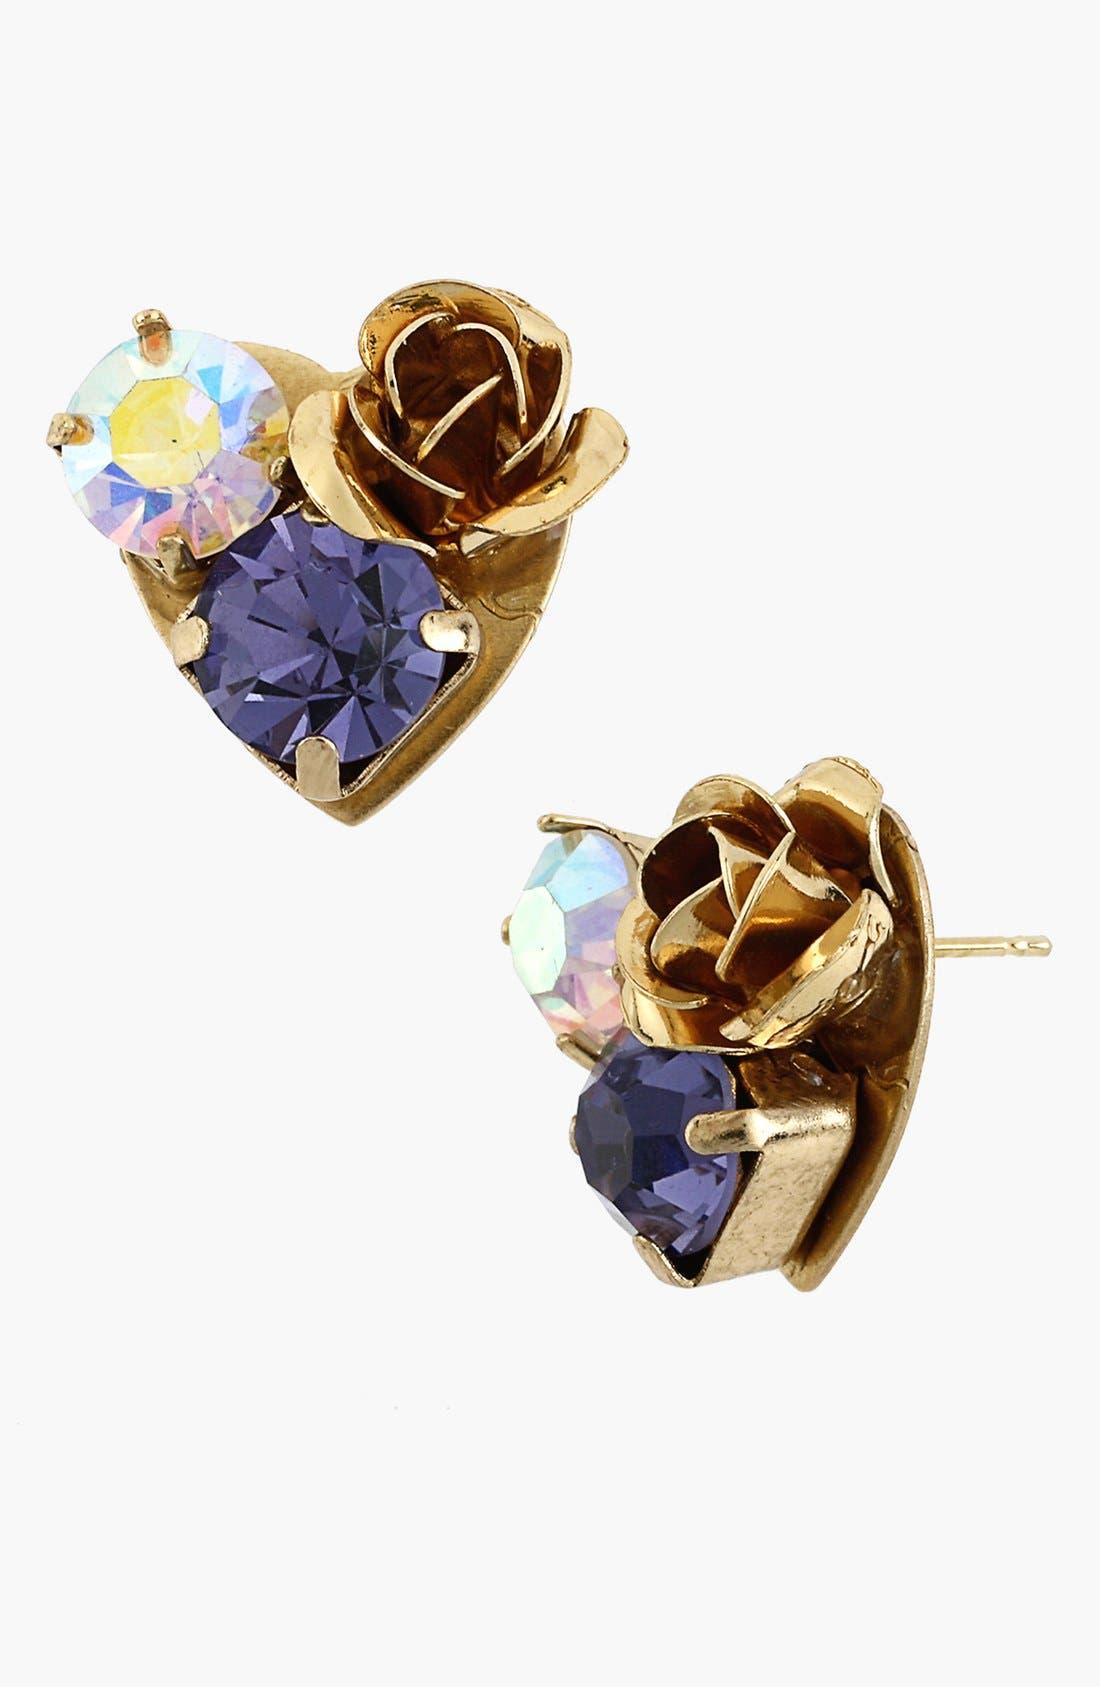 Alternate Image 1 Selected - Betsey Johnson 'Imperial' Rose Heart Stud Earrings